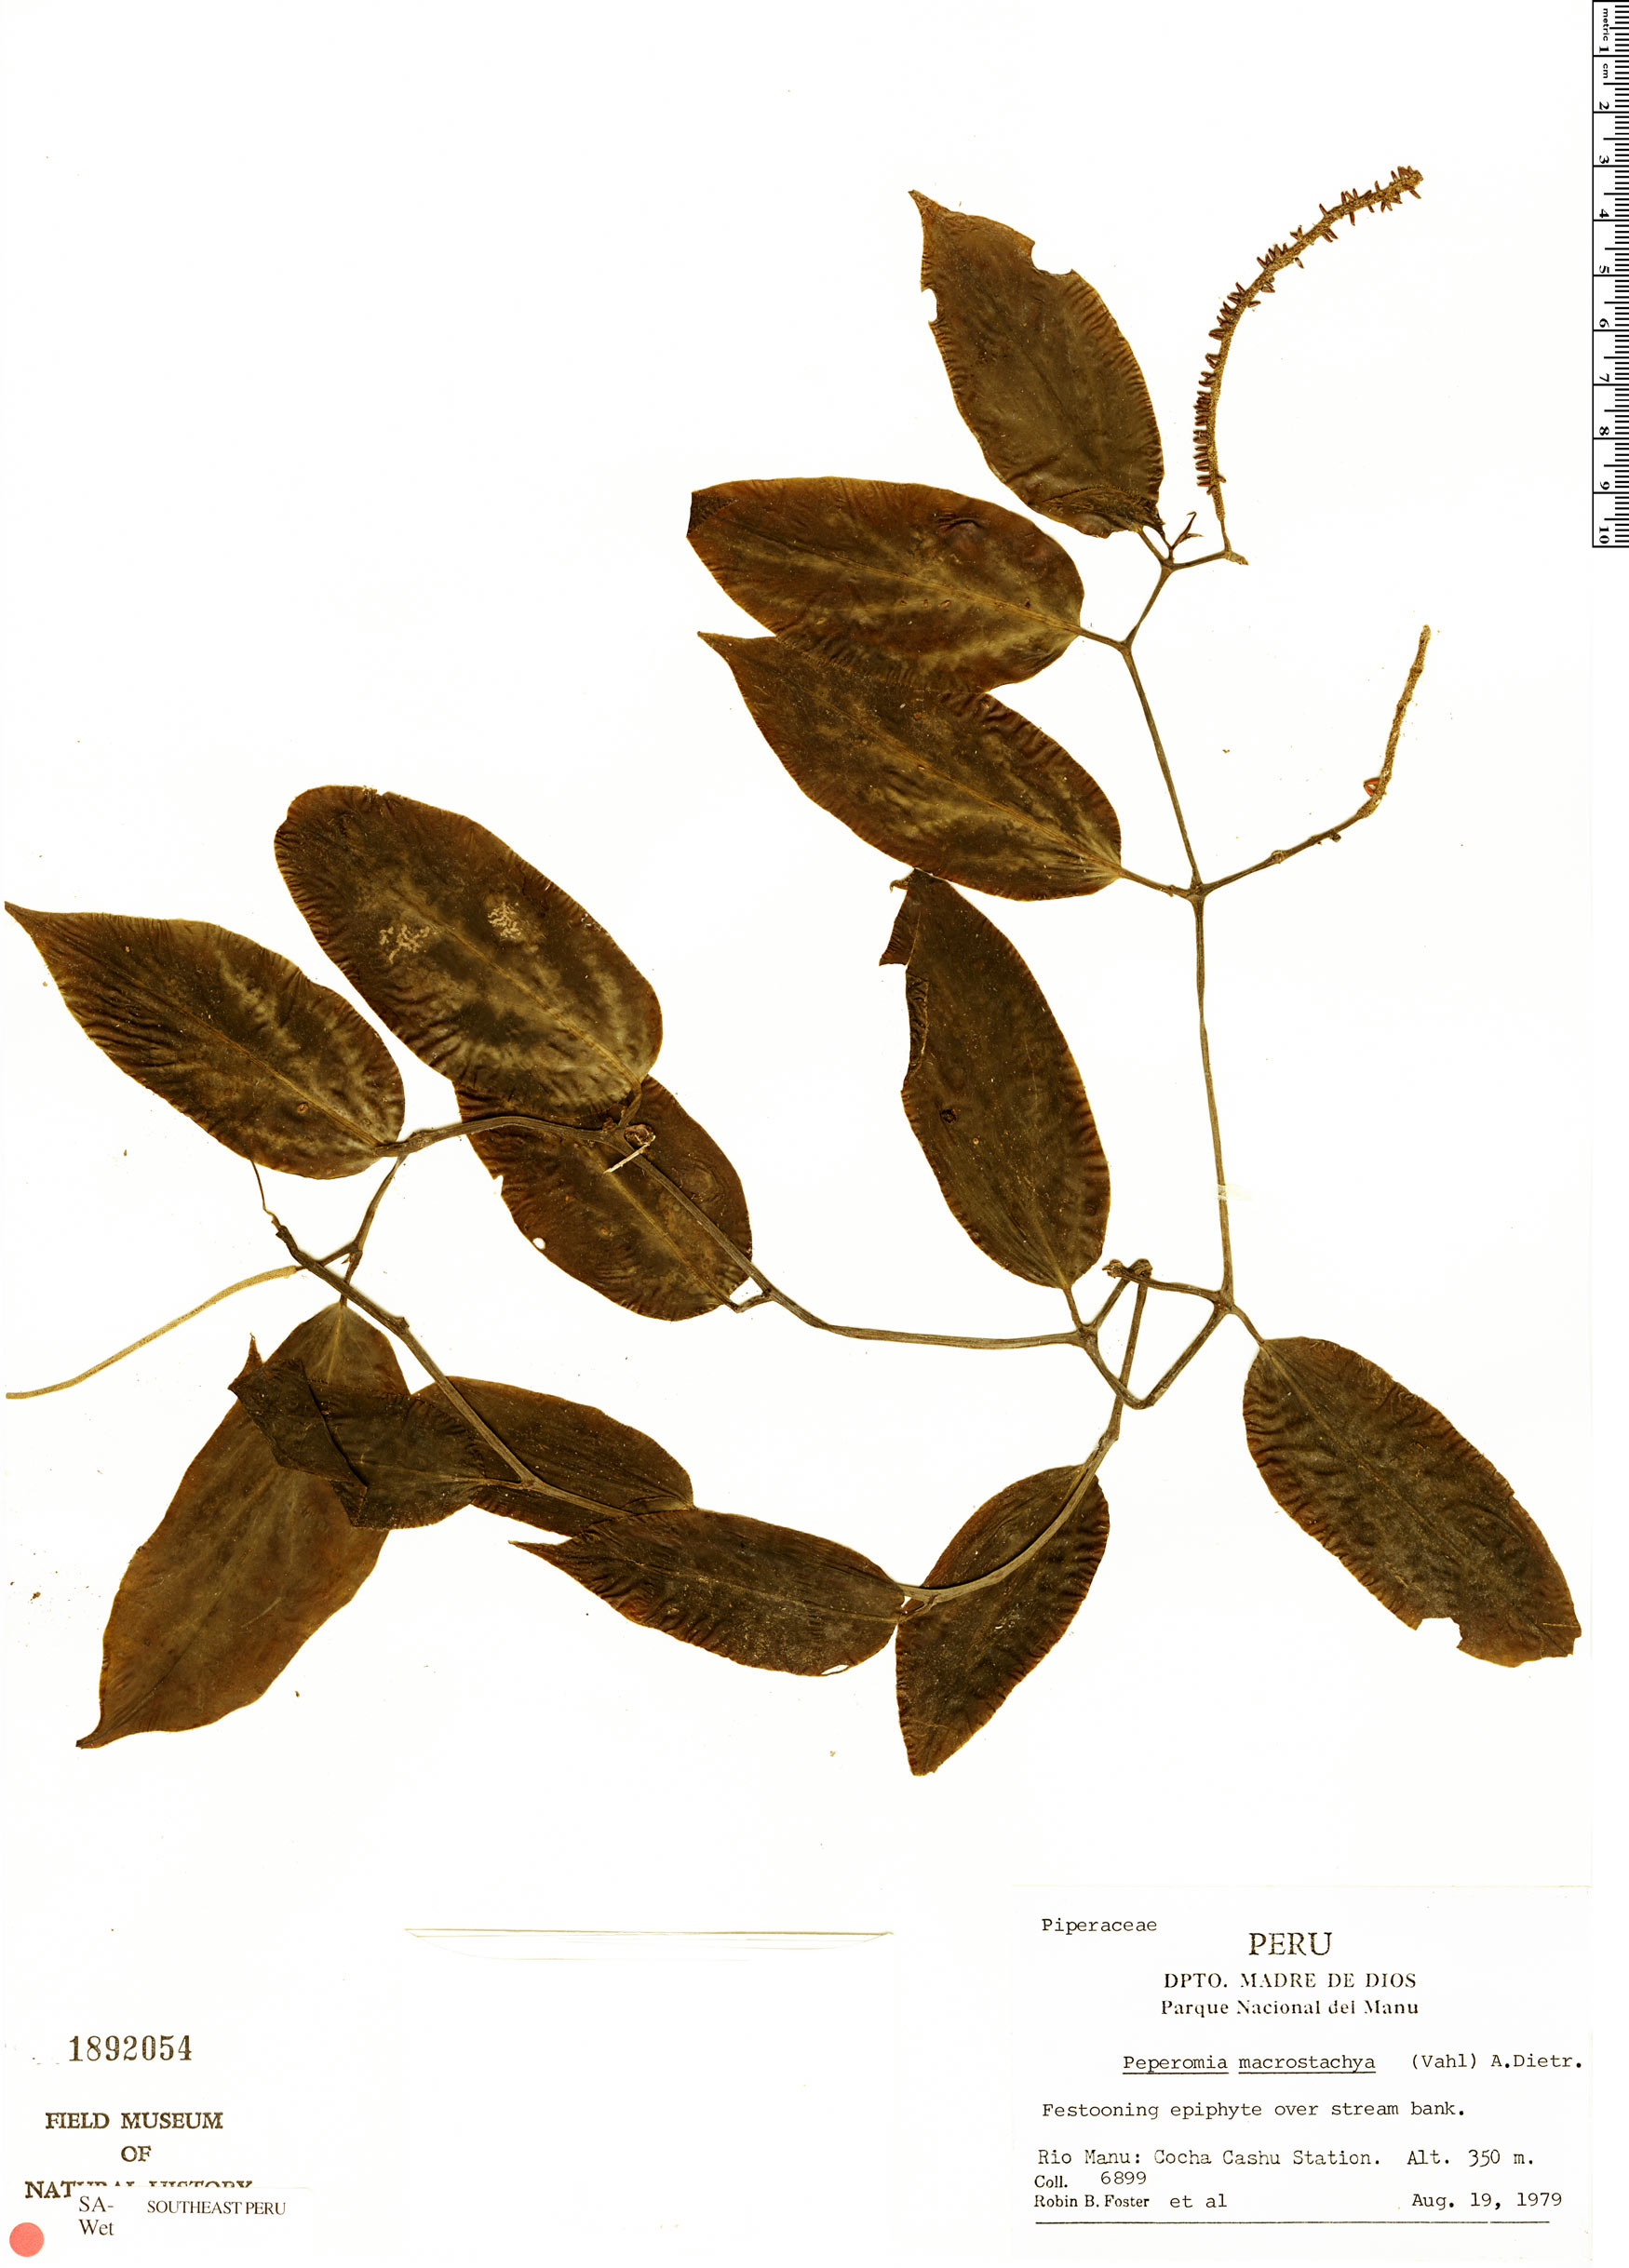 Specimen: Peperomia macrostachya